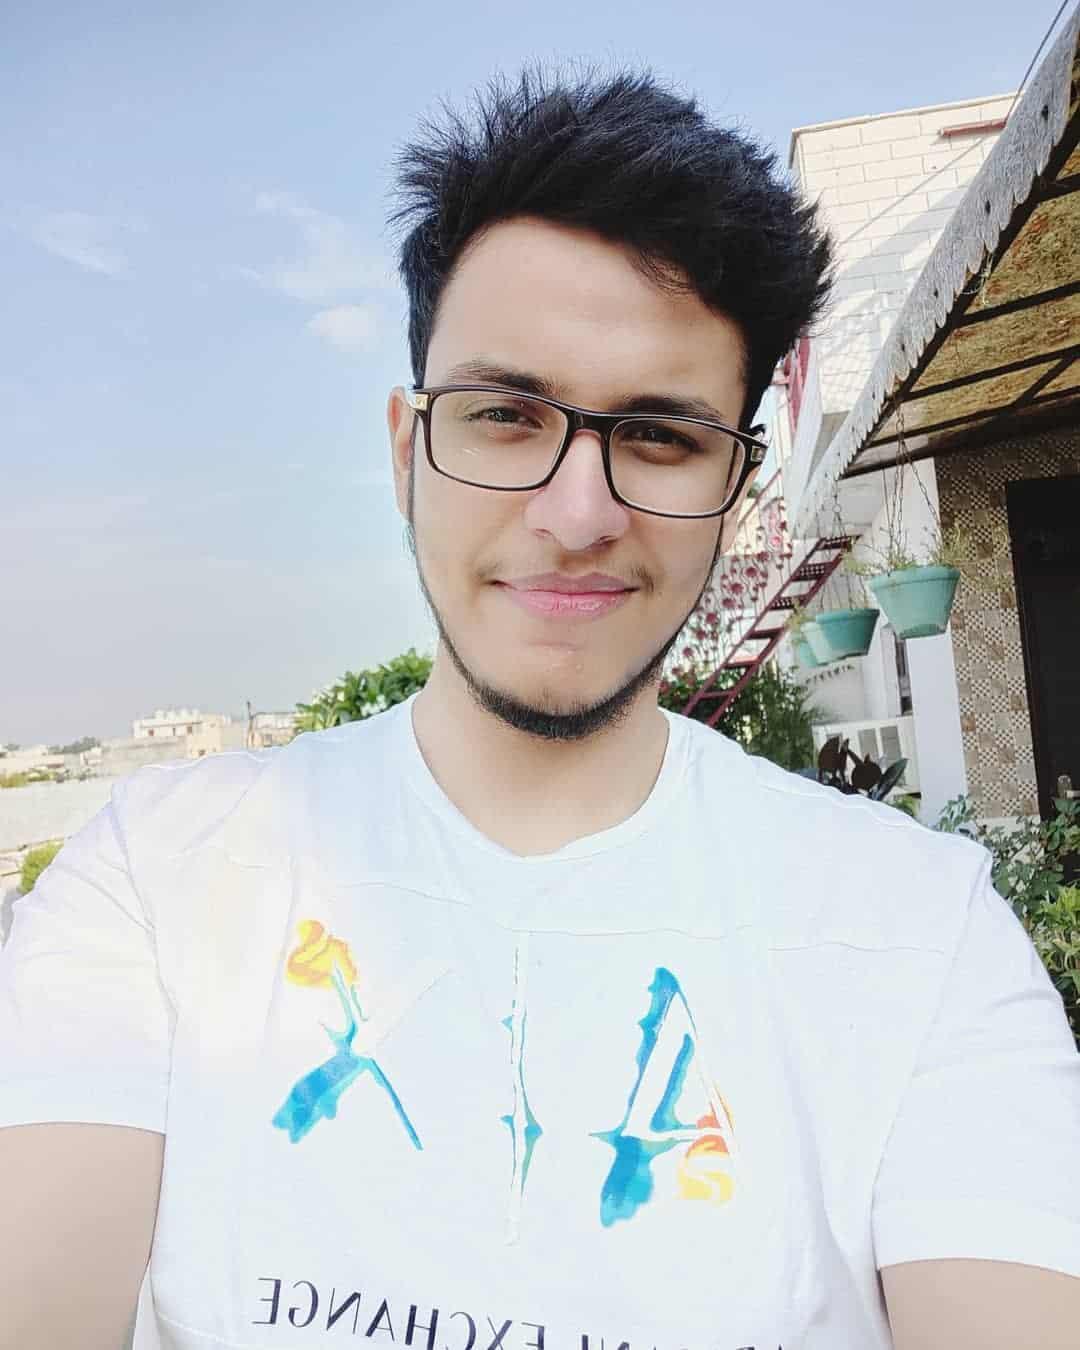 Nischay Malhan aka Triggered Insaan Profile| Contact Details (Phone number, Instagram, Twitter, YouTube, TikTok)